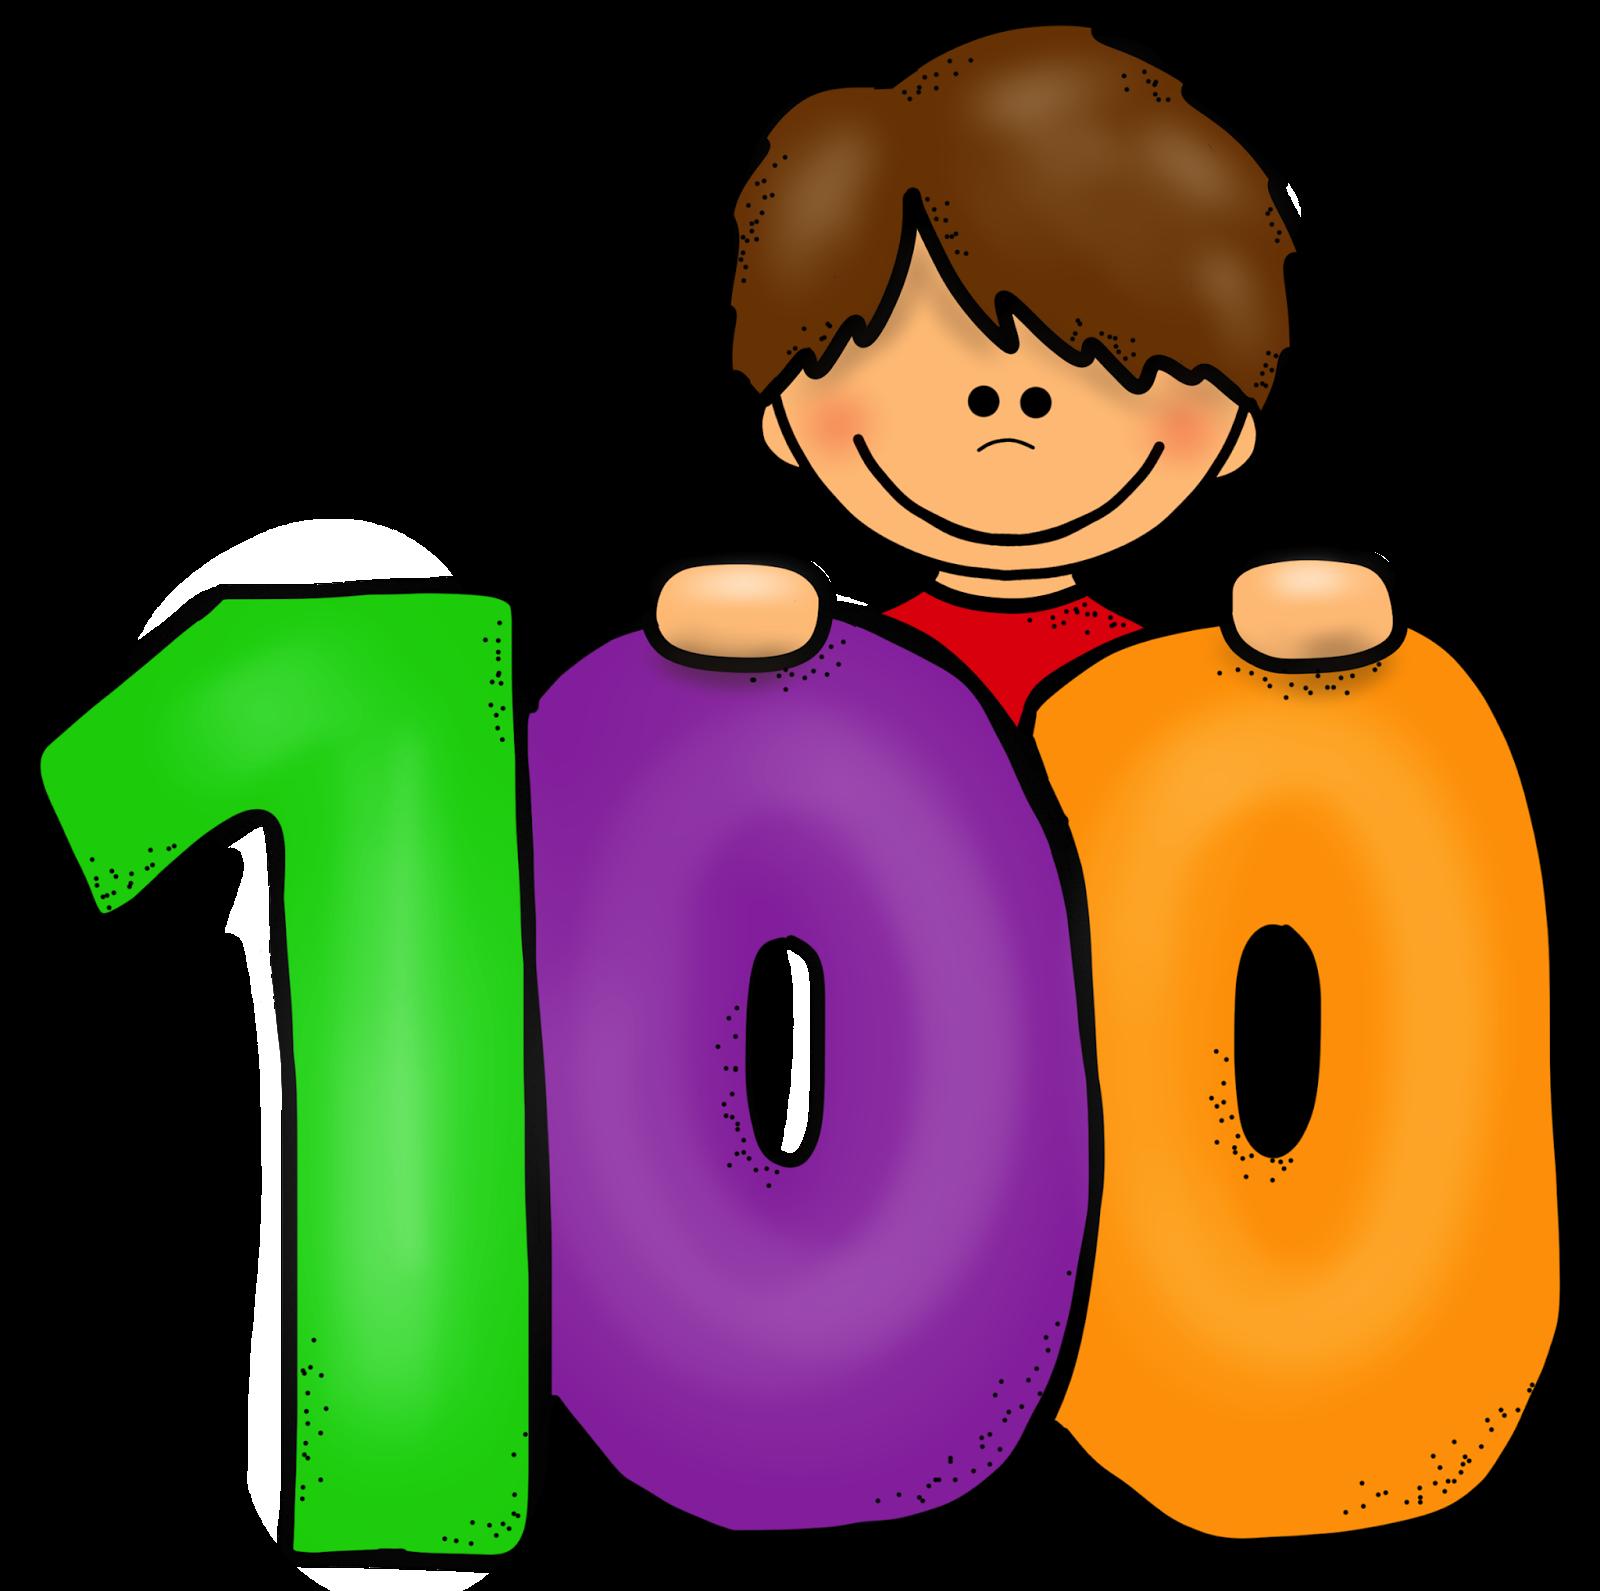 1600x1591 The Best Of Teacher Entrepreneurs Ii 100th Day Of School Ideas